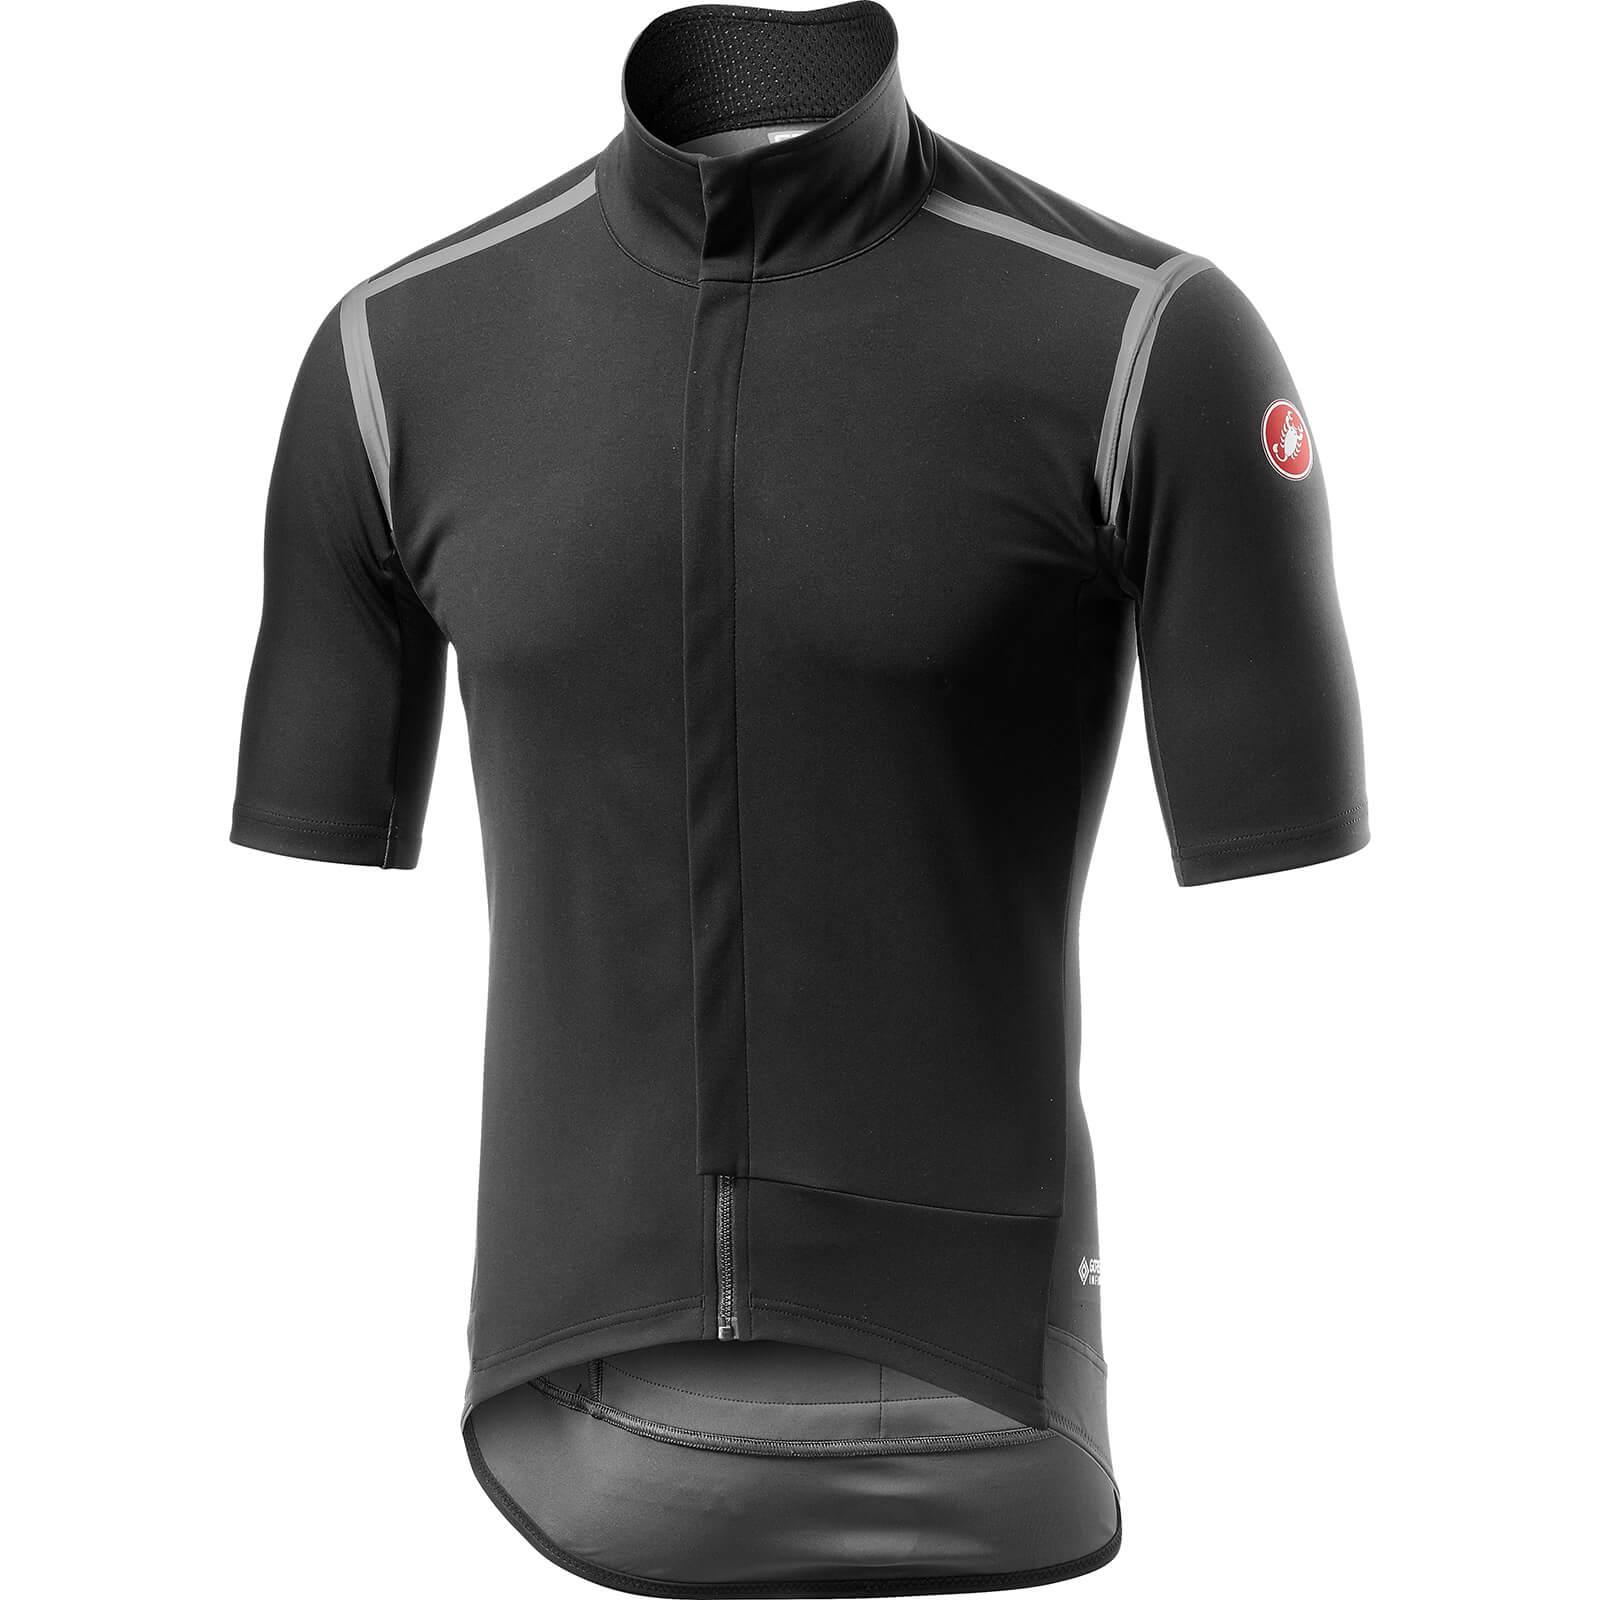 Image of Castelli Gabba RoS Jersey - M - Light Black